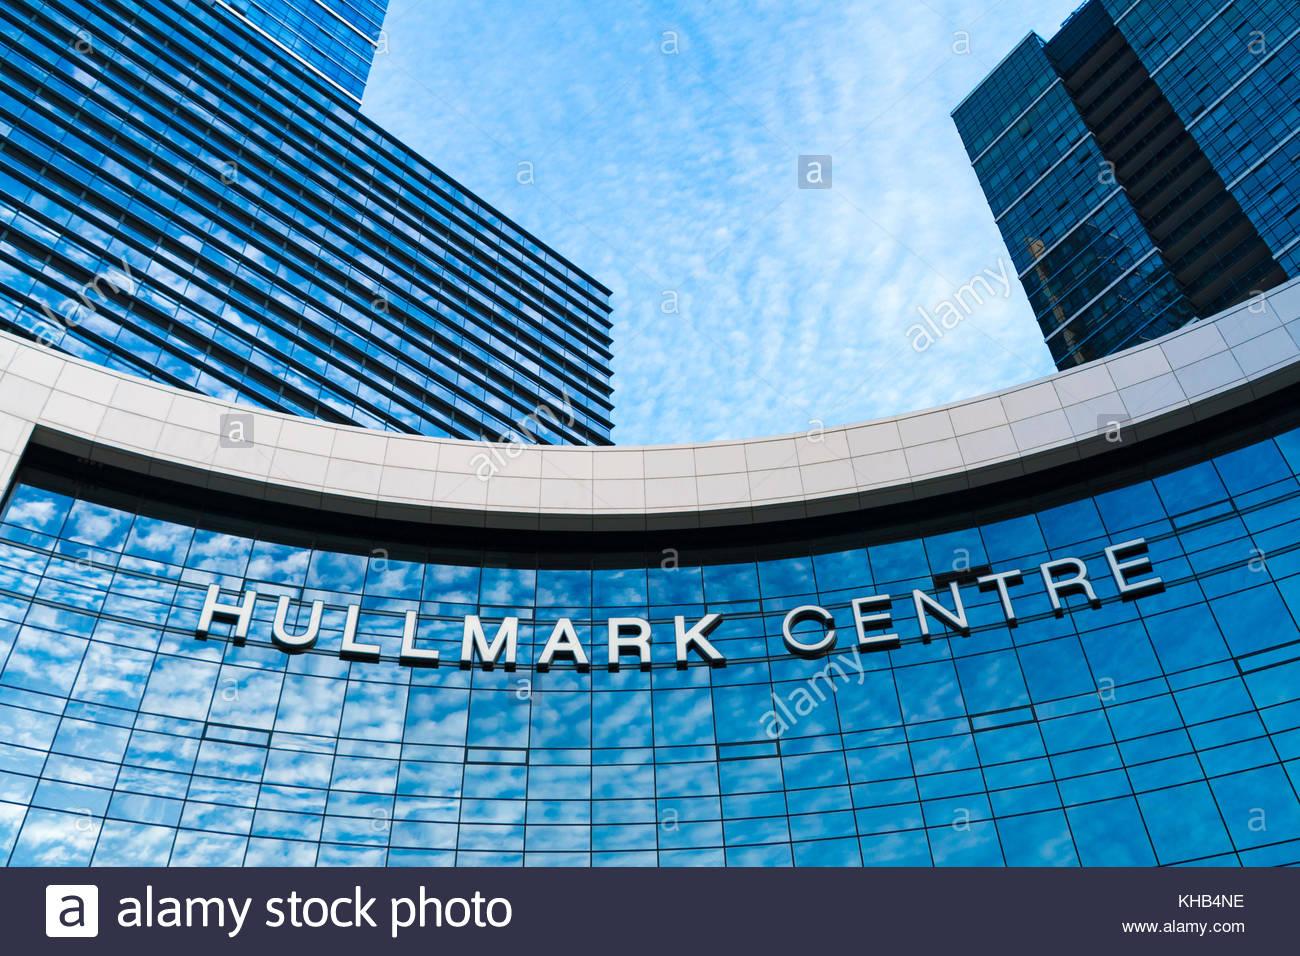 Hullmark Centre in Yonge Street, modern architecture